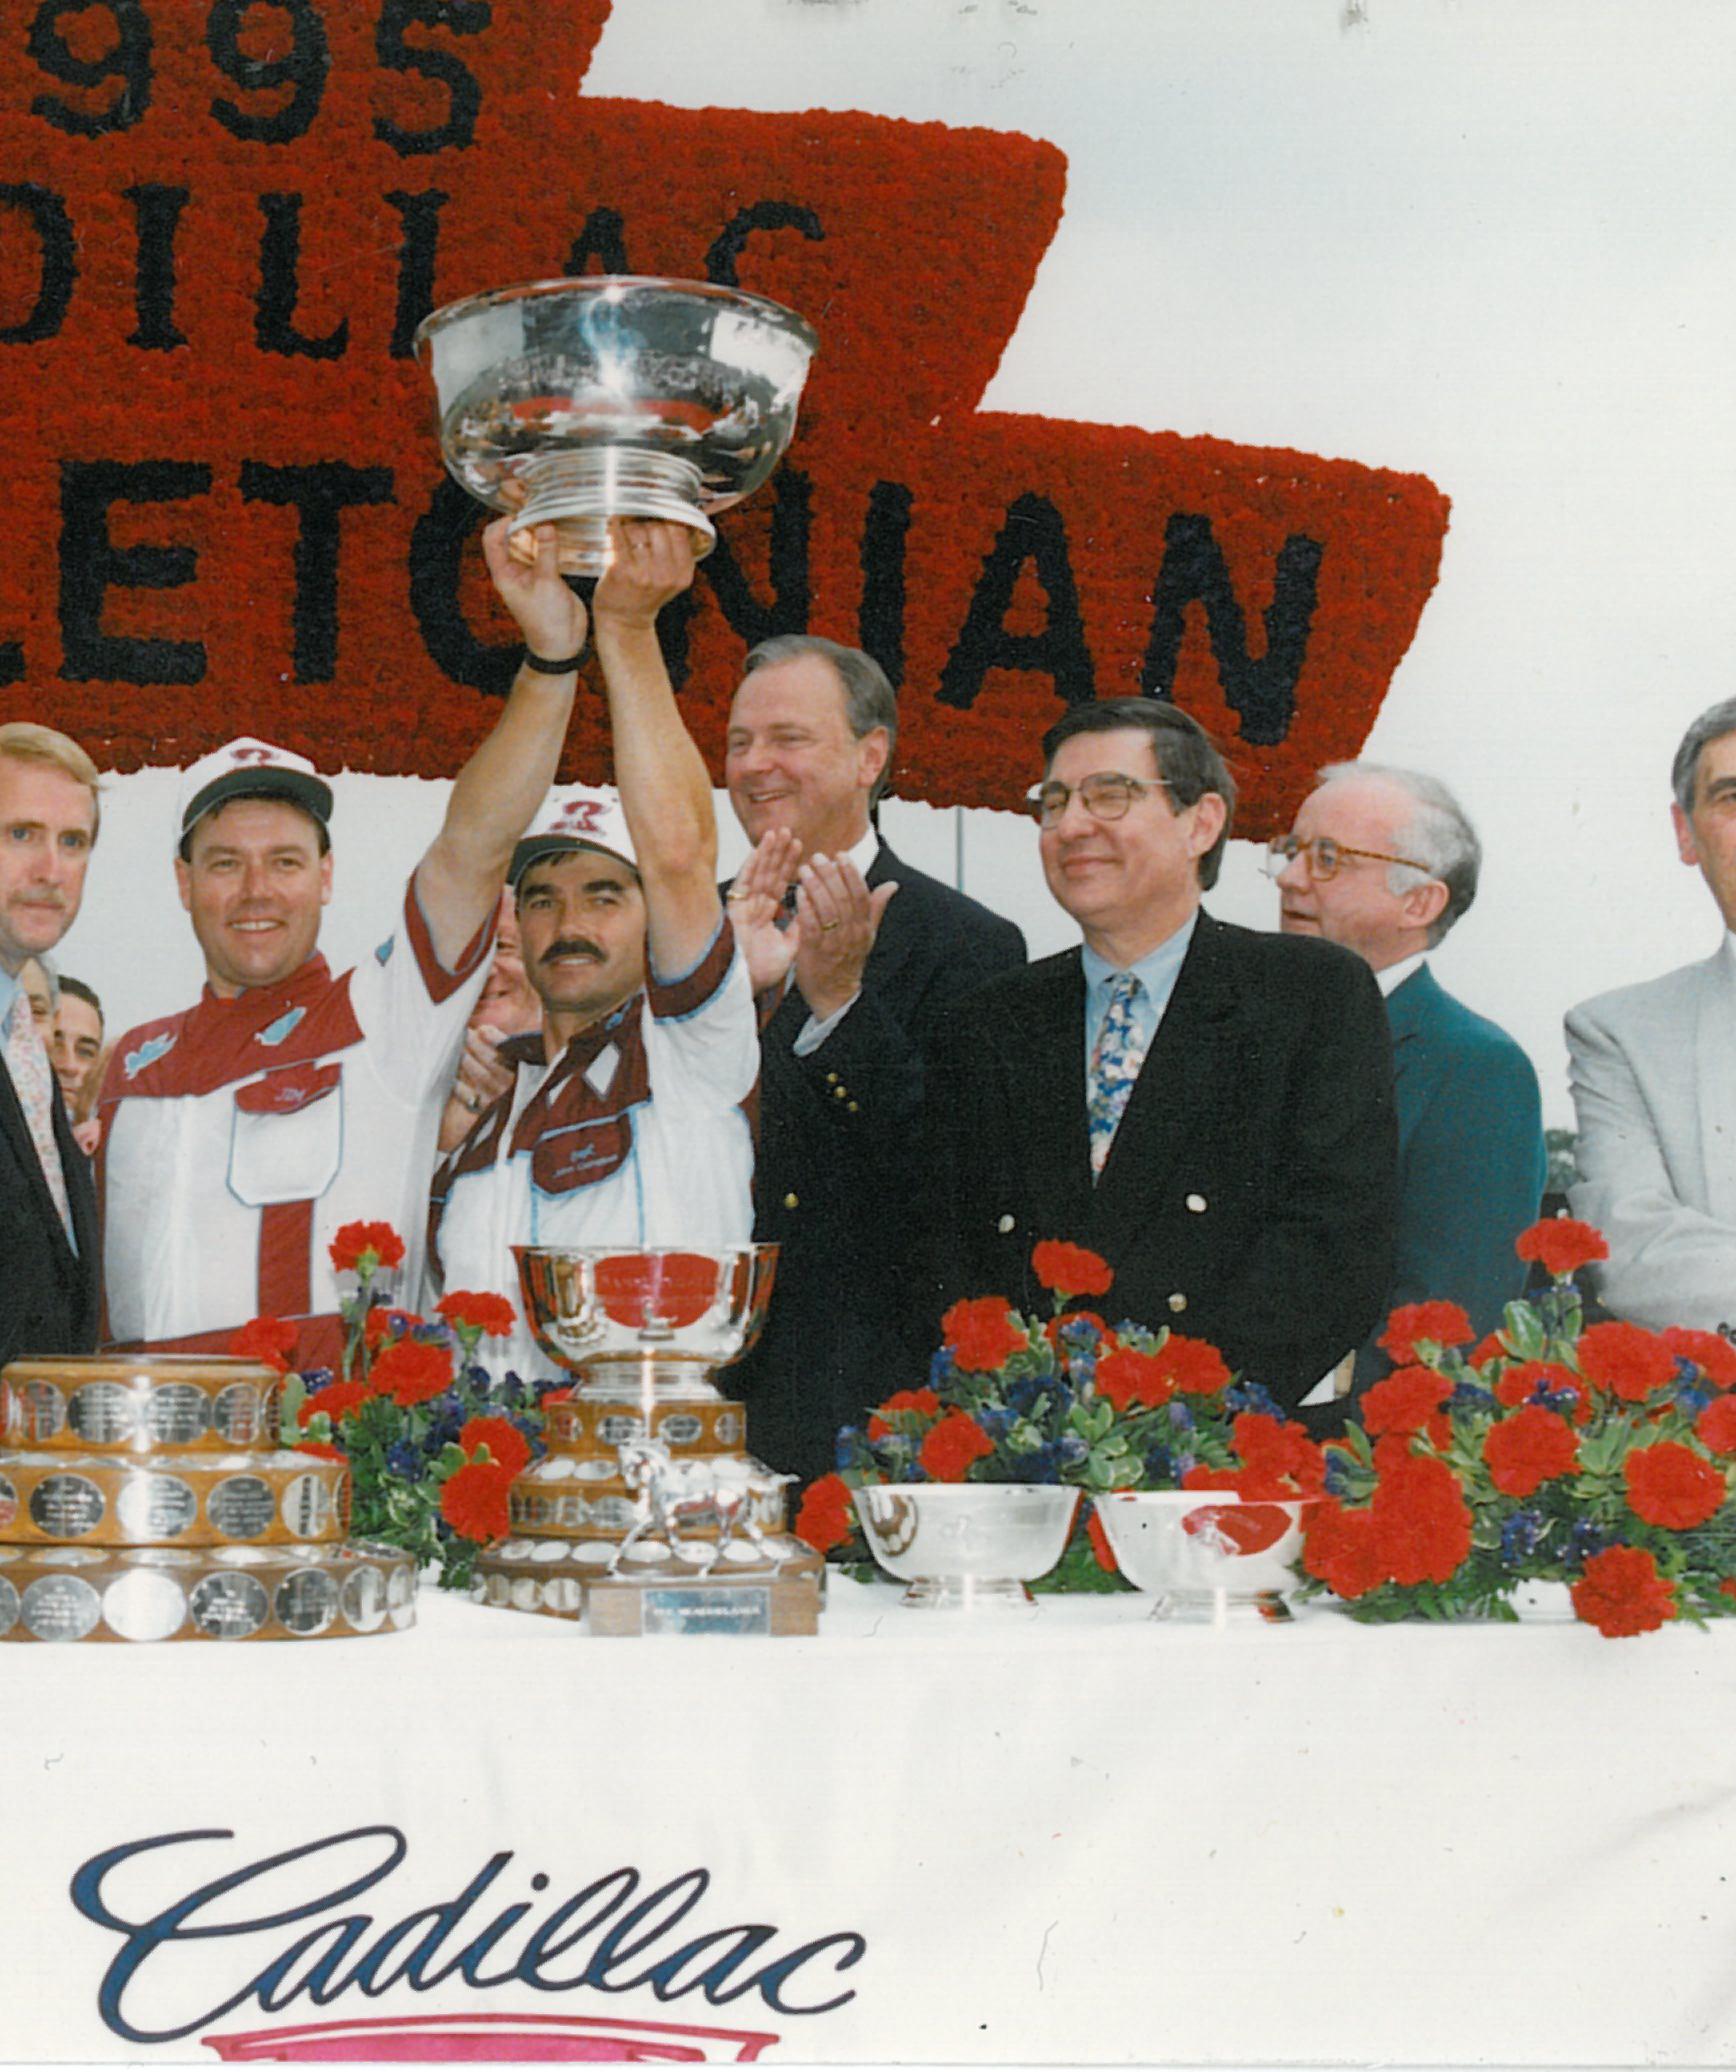 1995 Hambletonian Winners Circle.jpg